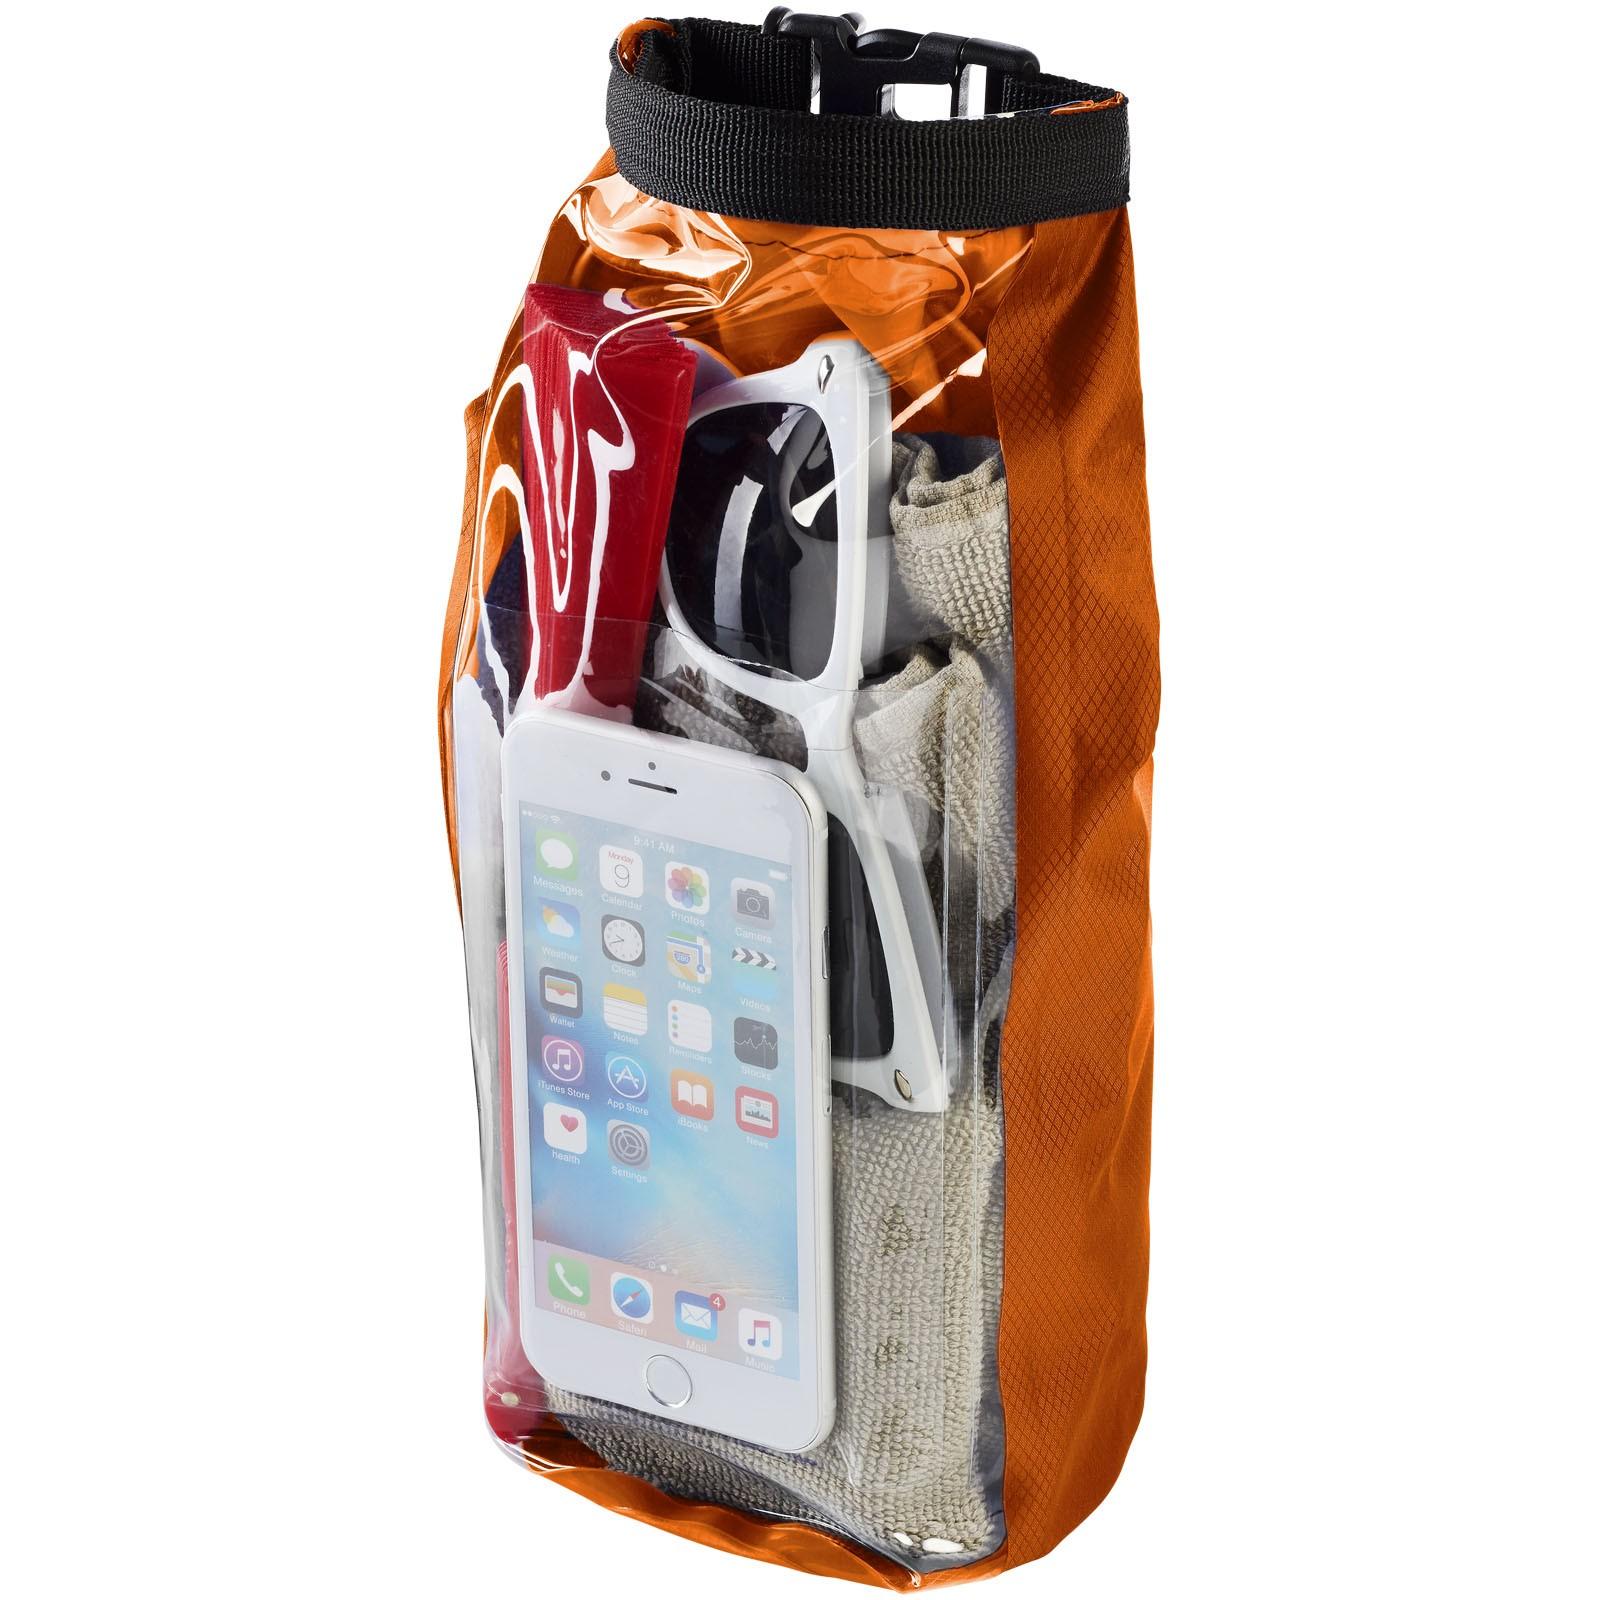 "Bolsa impermeable de 2L con ventana para teléfono ""Tourist"" - Naranja"